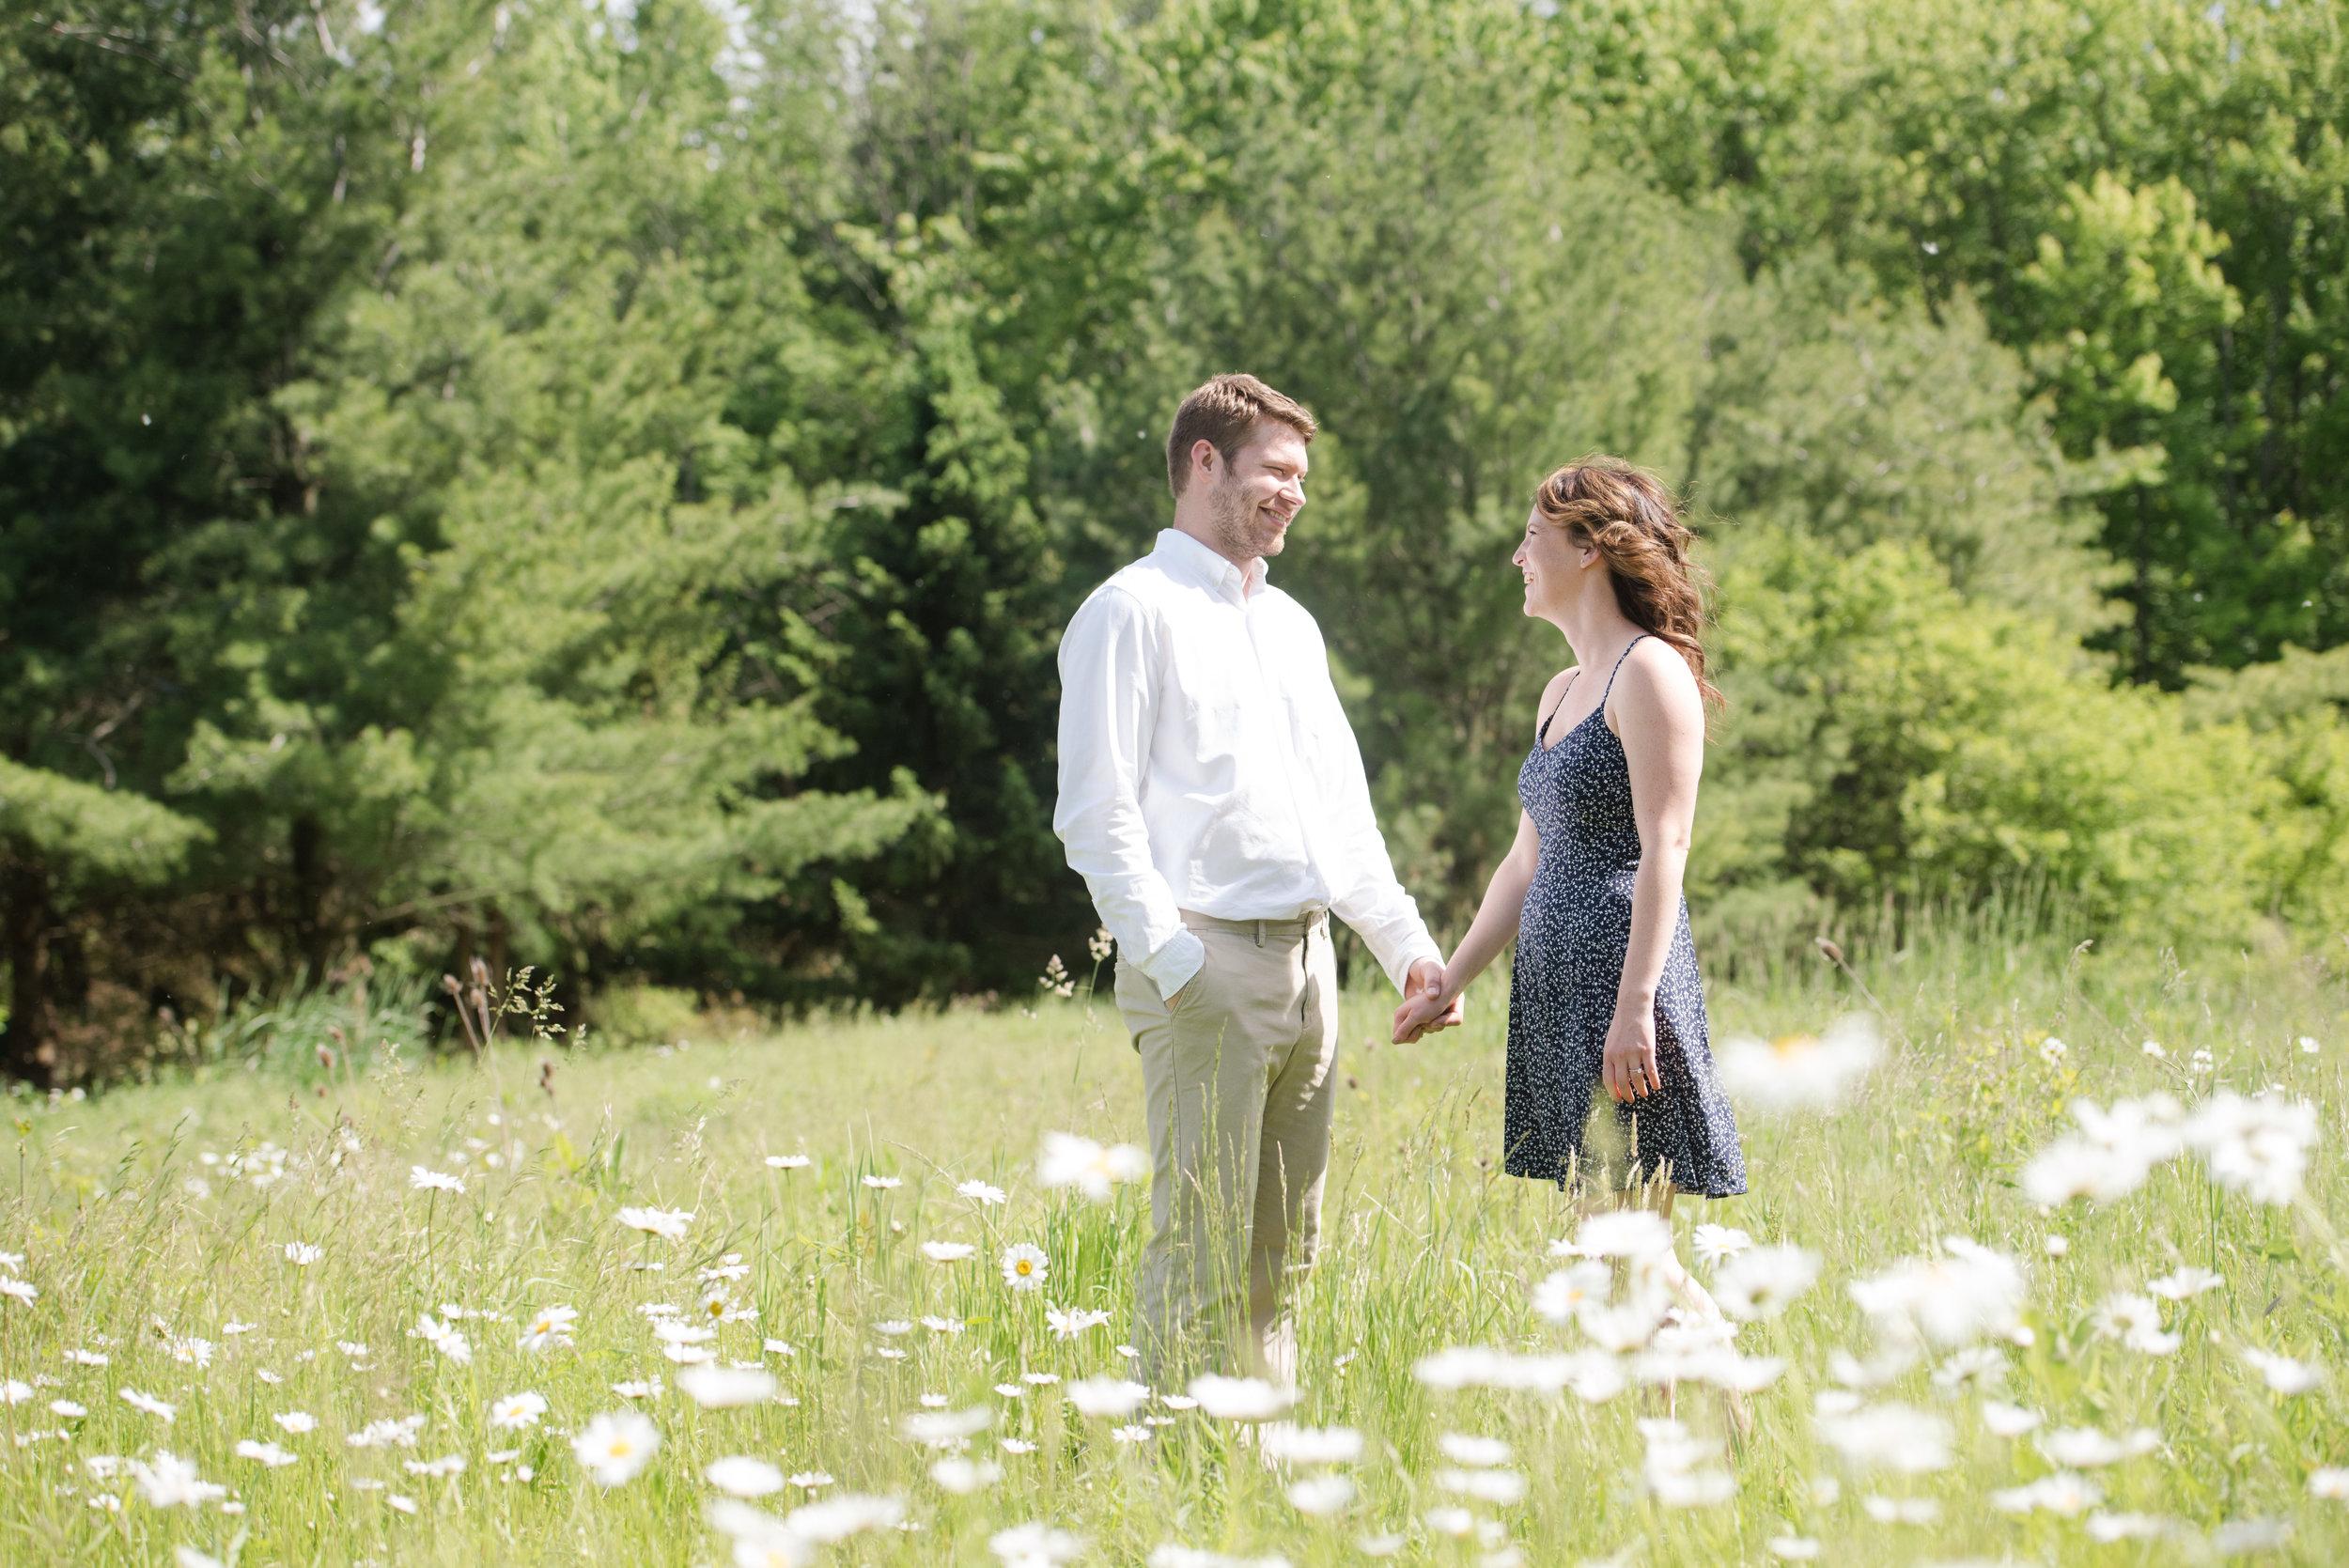 GALLERY-2019-6-9 Kaitlin, Justin & Liam Engagement 0570 75.jpg